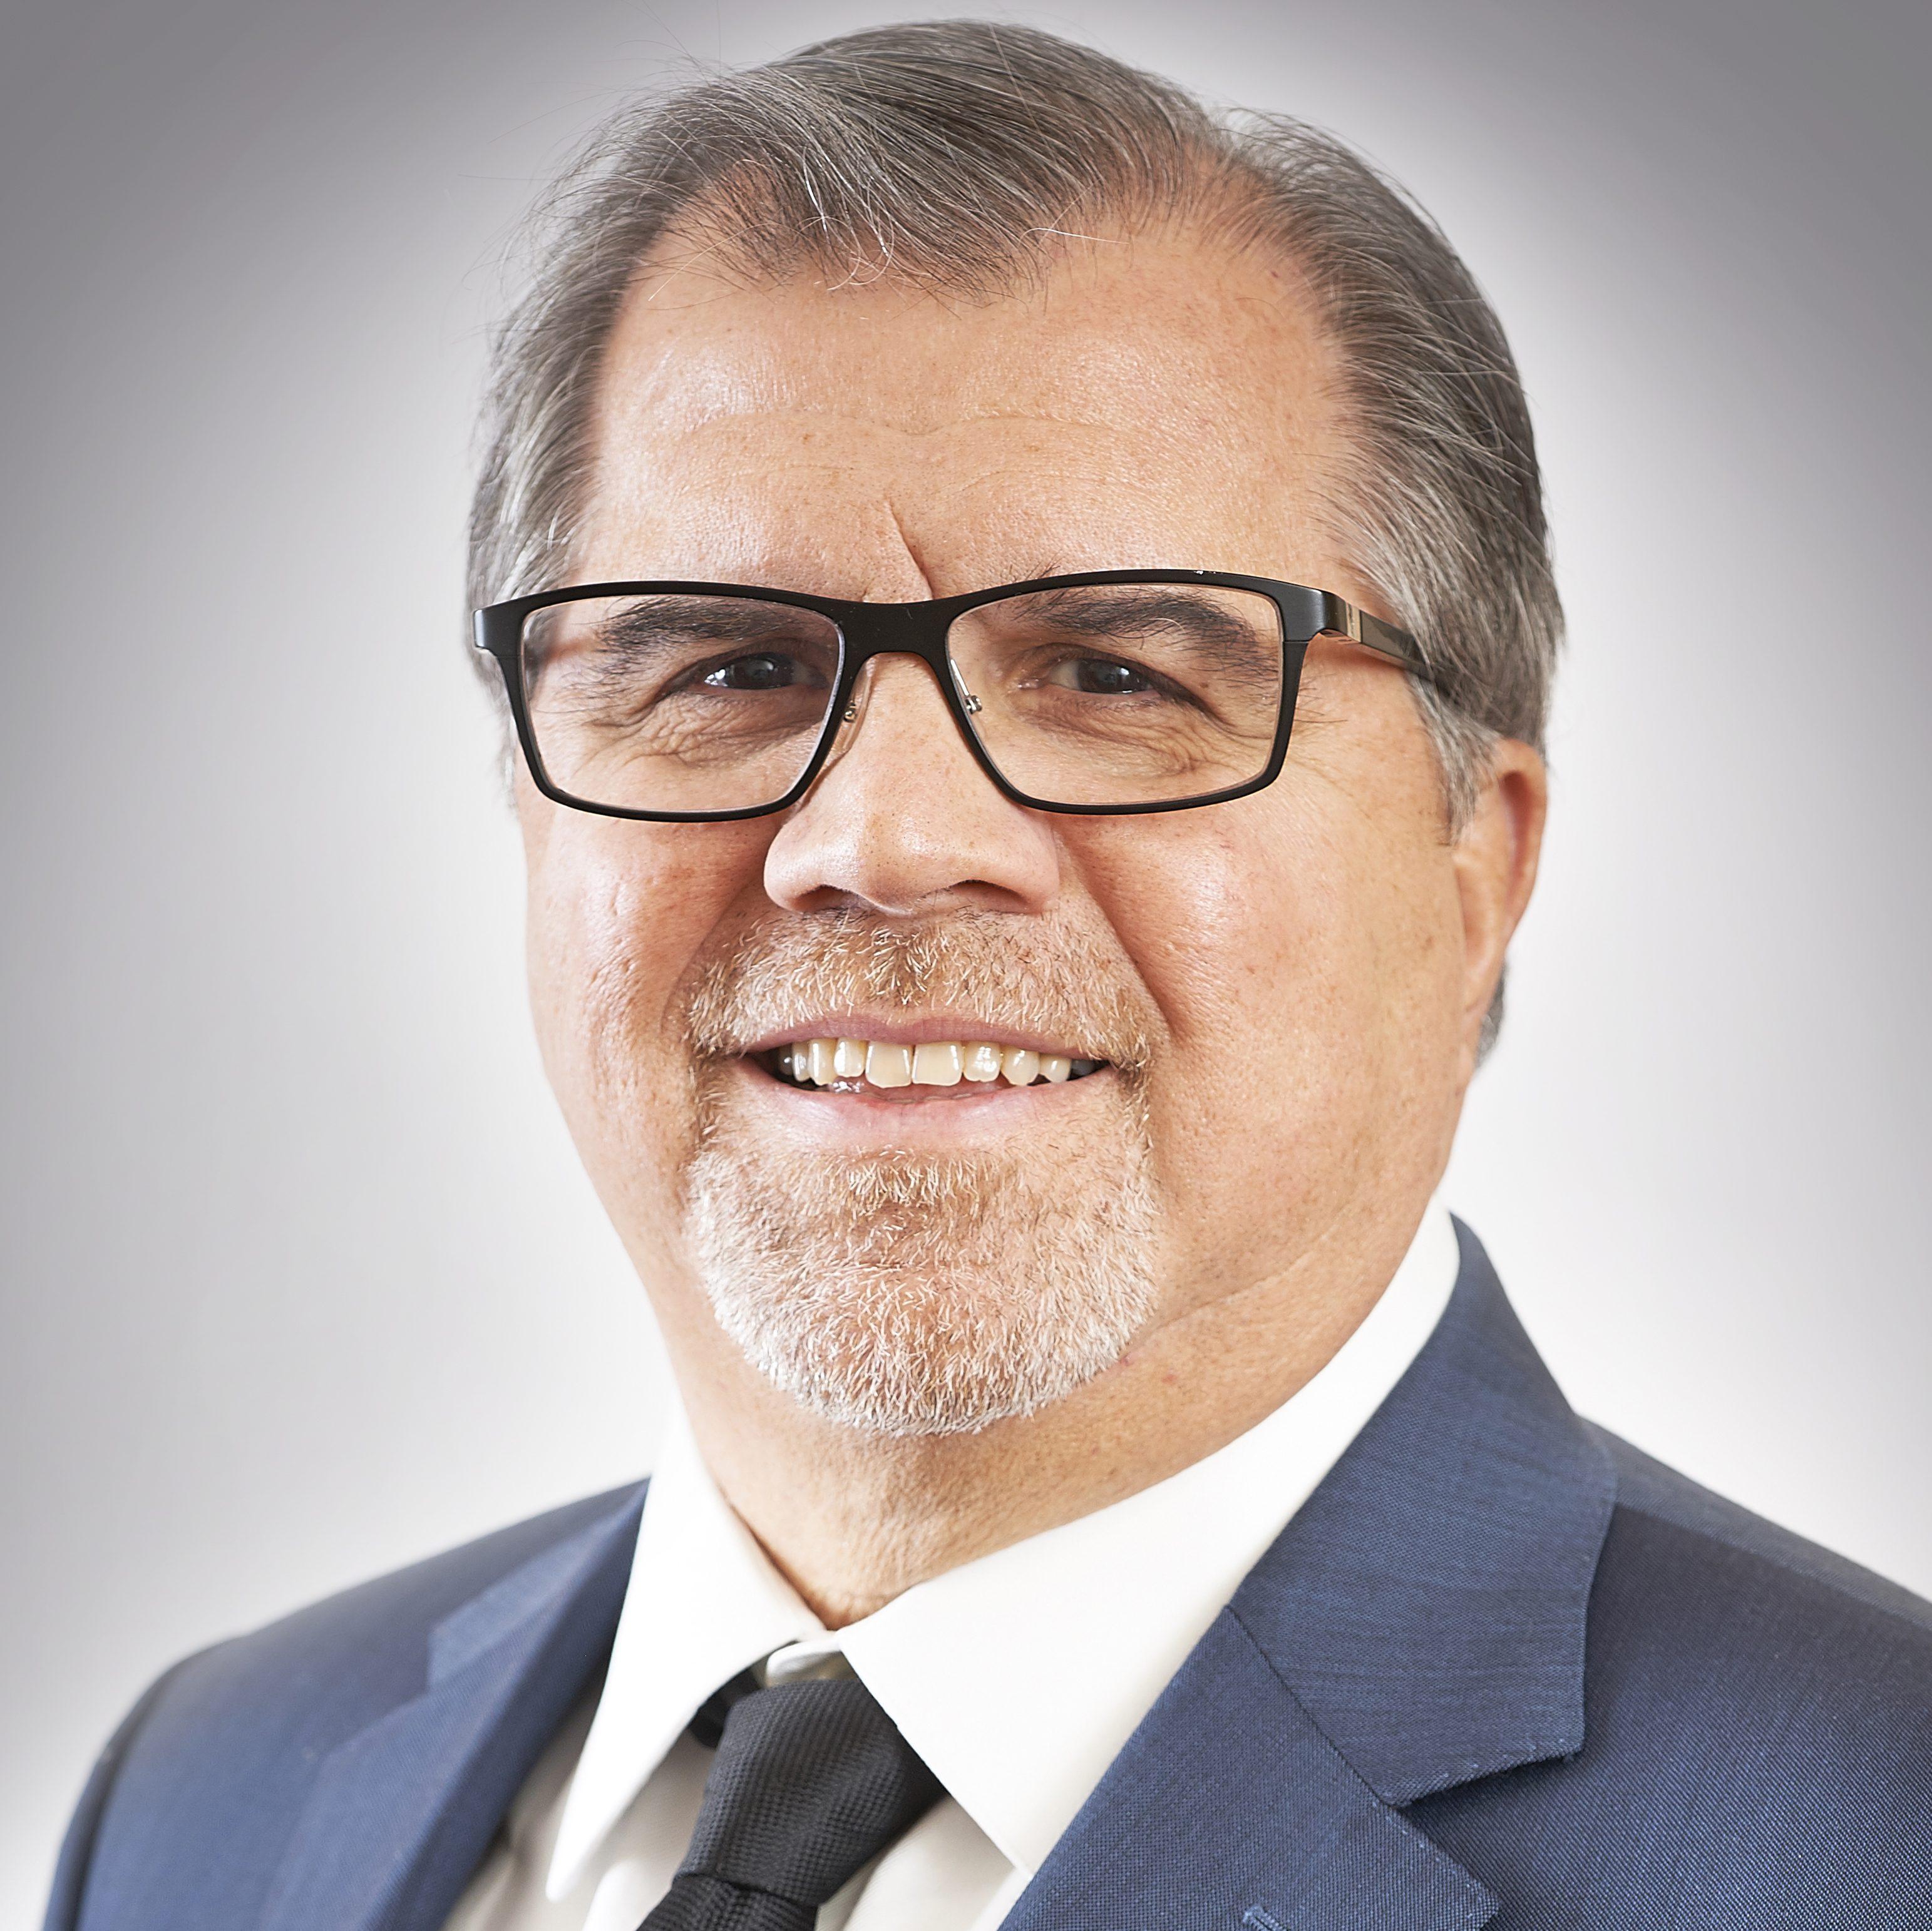 Frank Del Rio